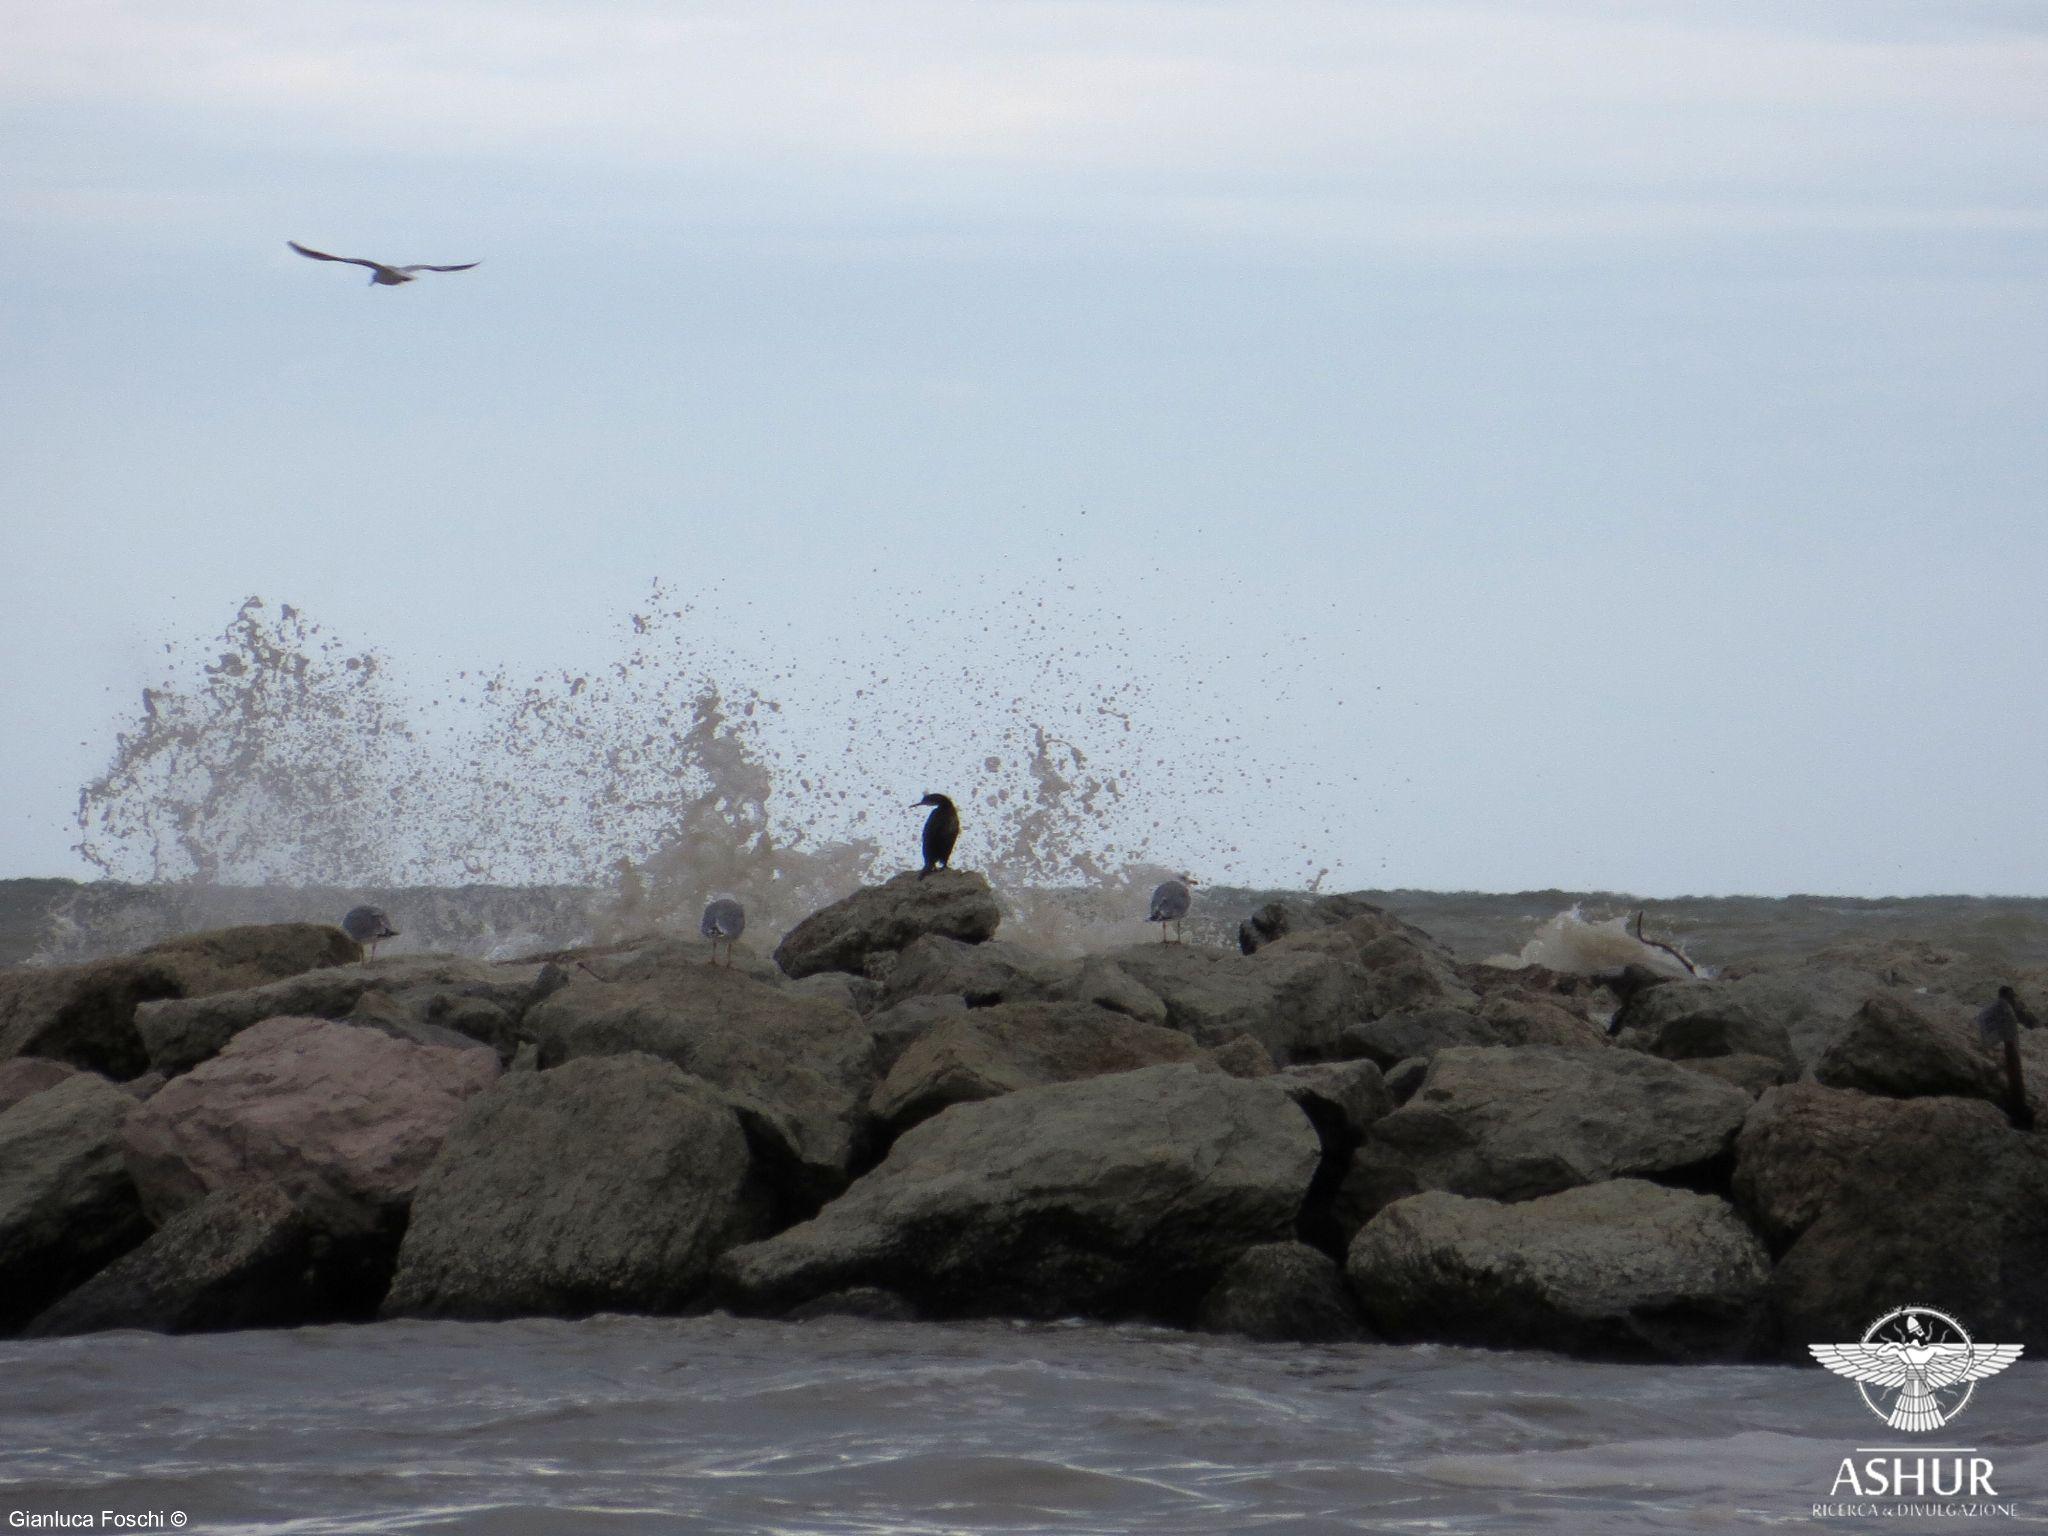 Jonathan Livingston Seagull by Gianluca Foschi